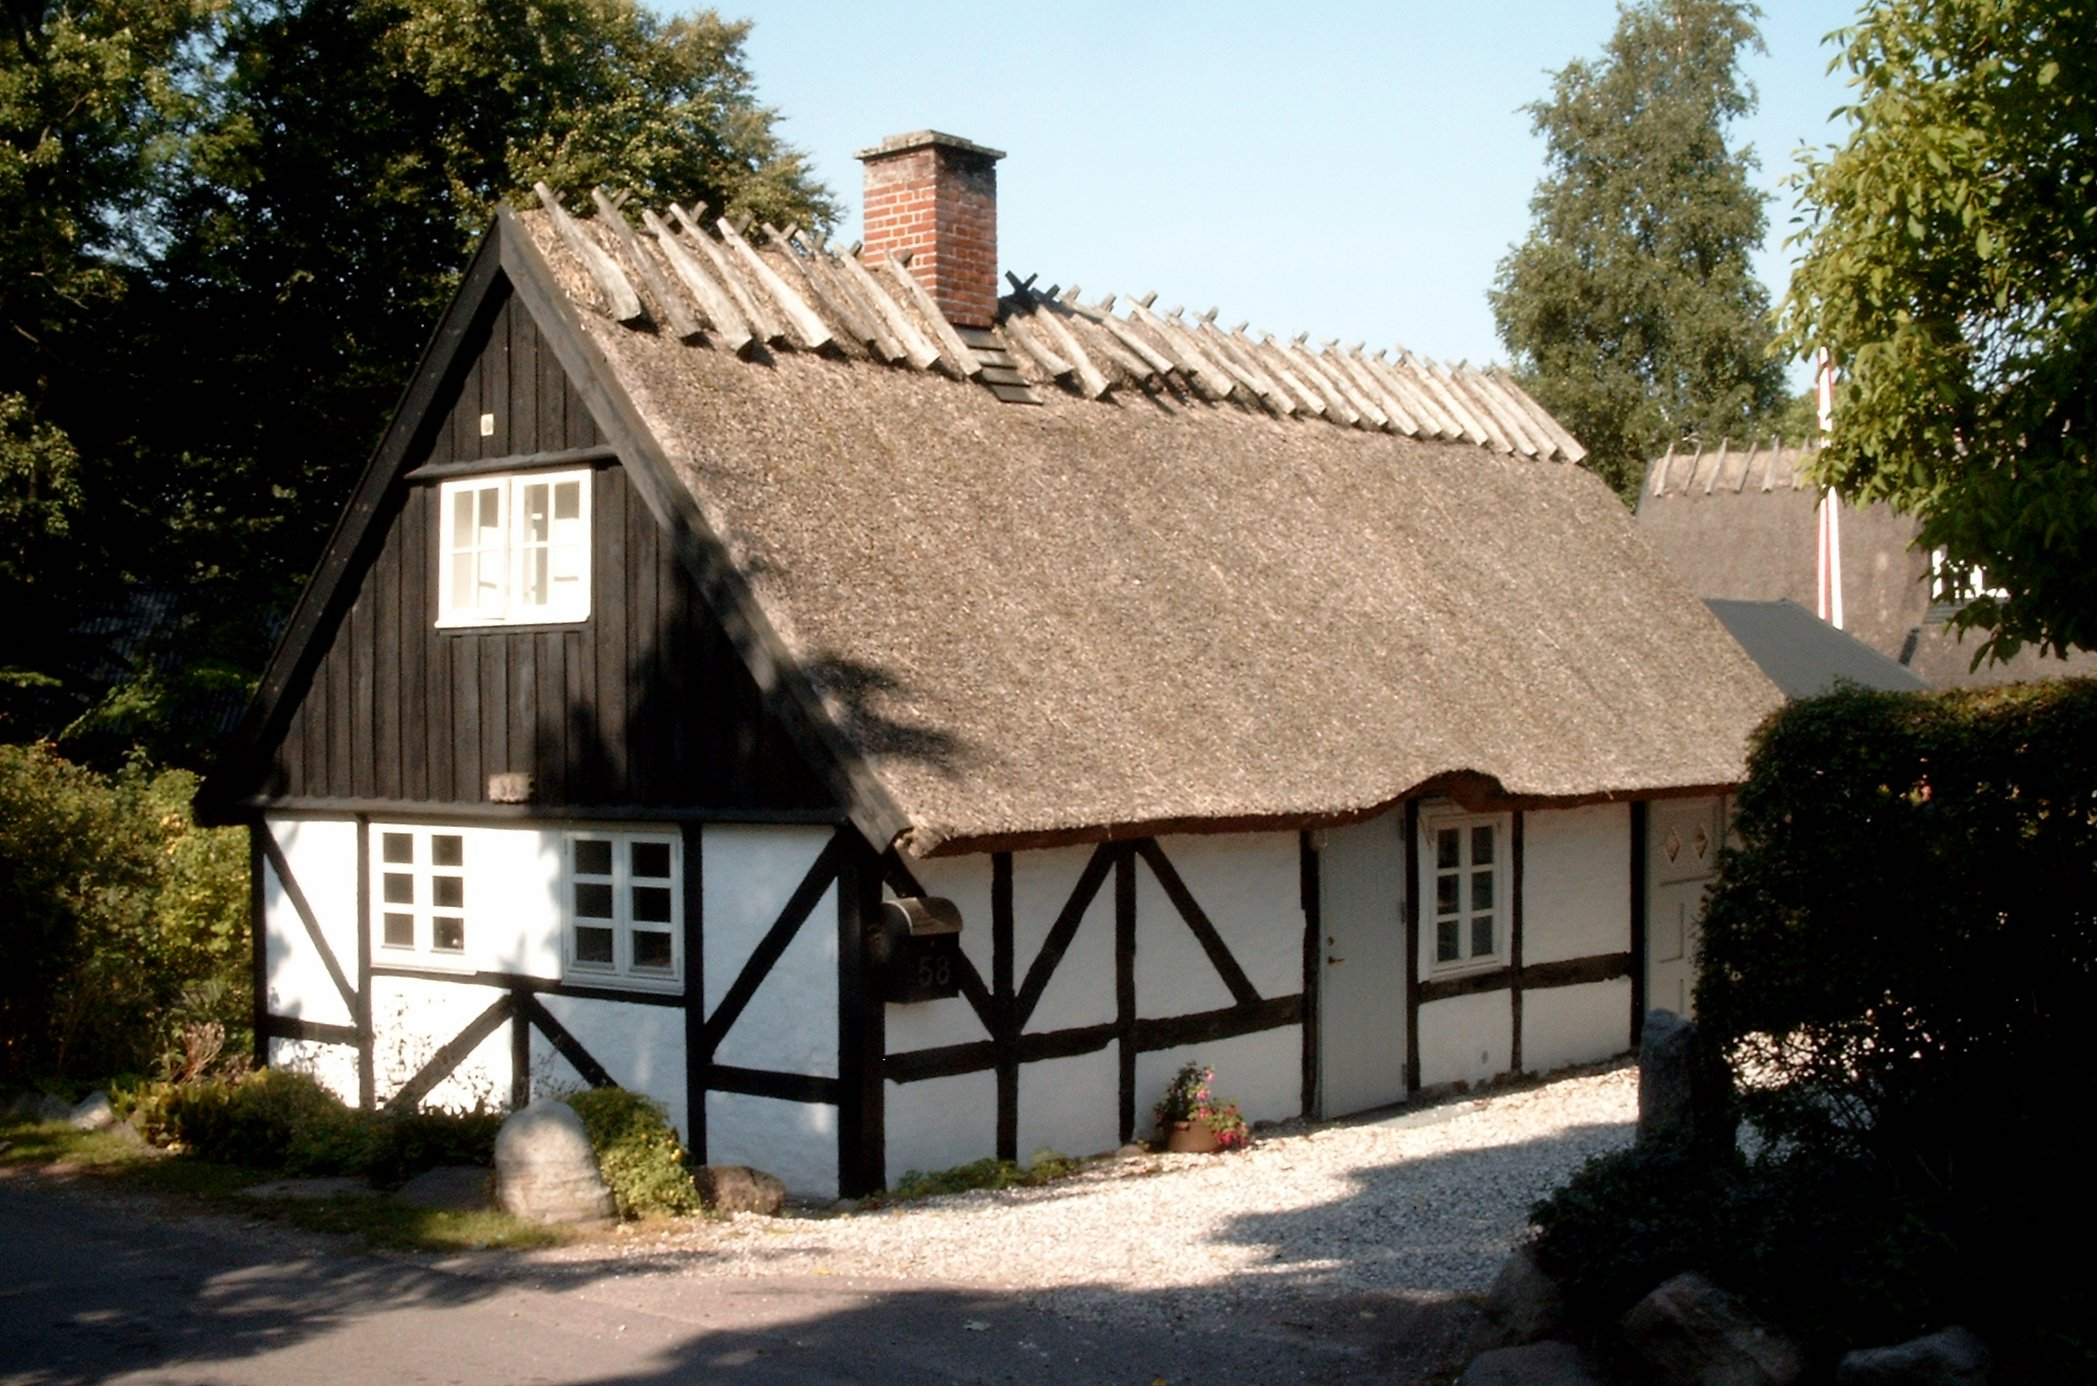 File:HT village house 4.jpg - Wikimedia Commonshouse village